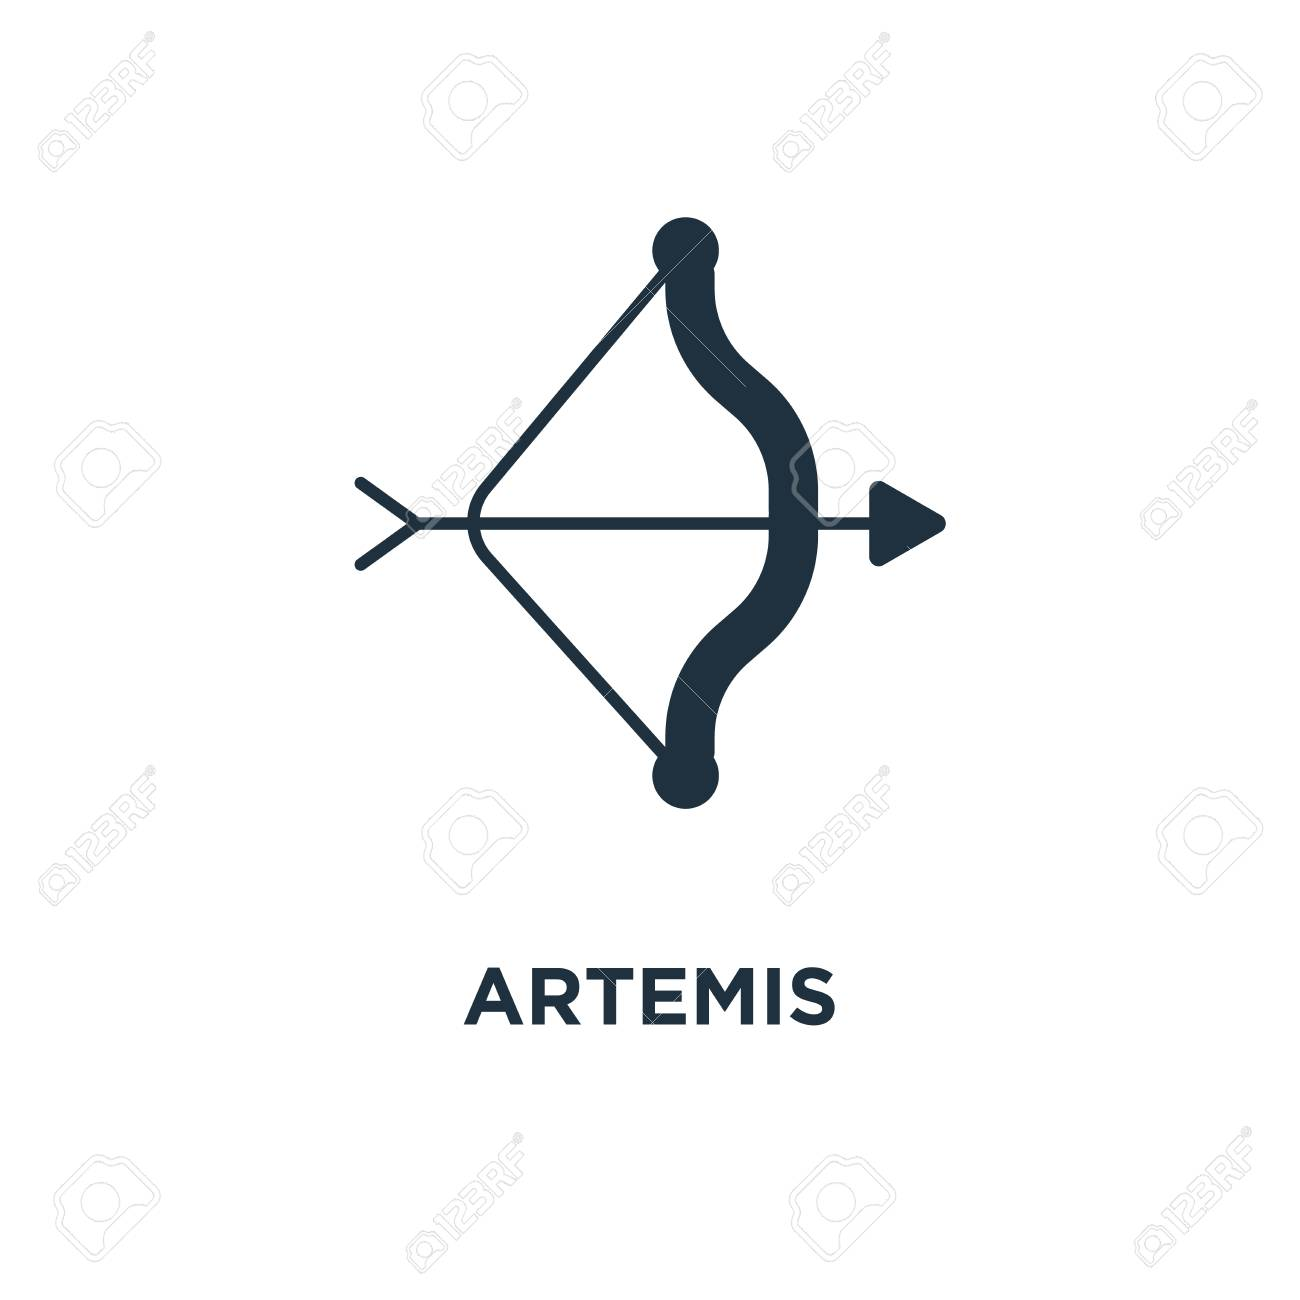 Artemis icon. Black filled vector illustration. Artemis symbol..